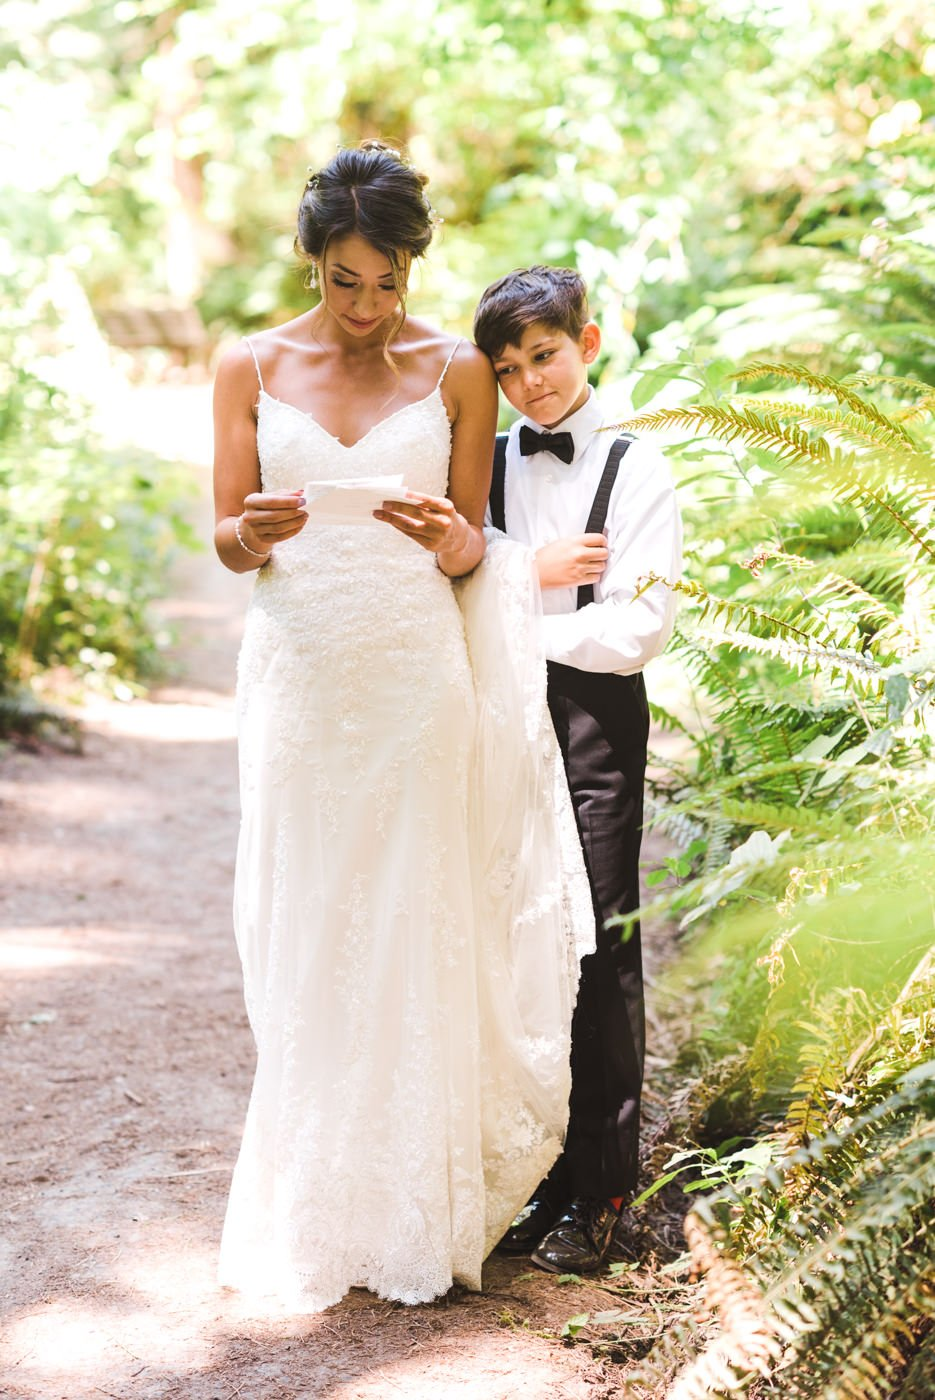 Downtown Portland Summer Wedding at Hoyt Arboretum